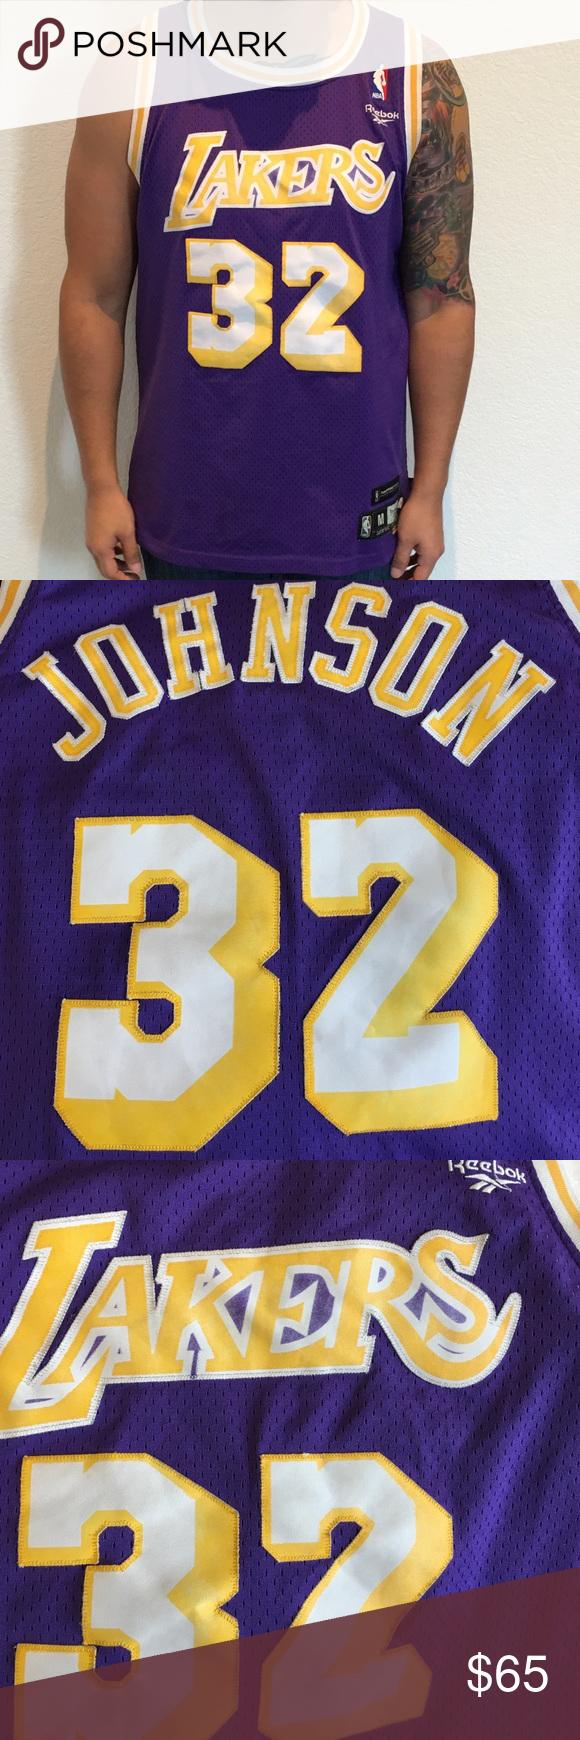 Los Angeles Lakers Magic Johnson Jersey Clothes Design Magic Johnson Fashion Tips